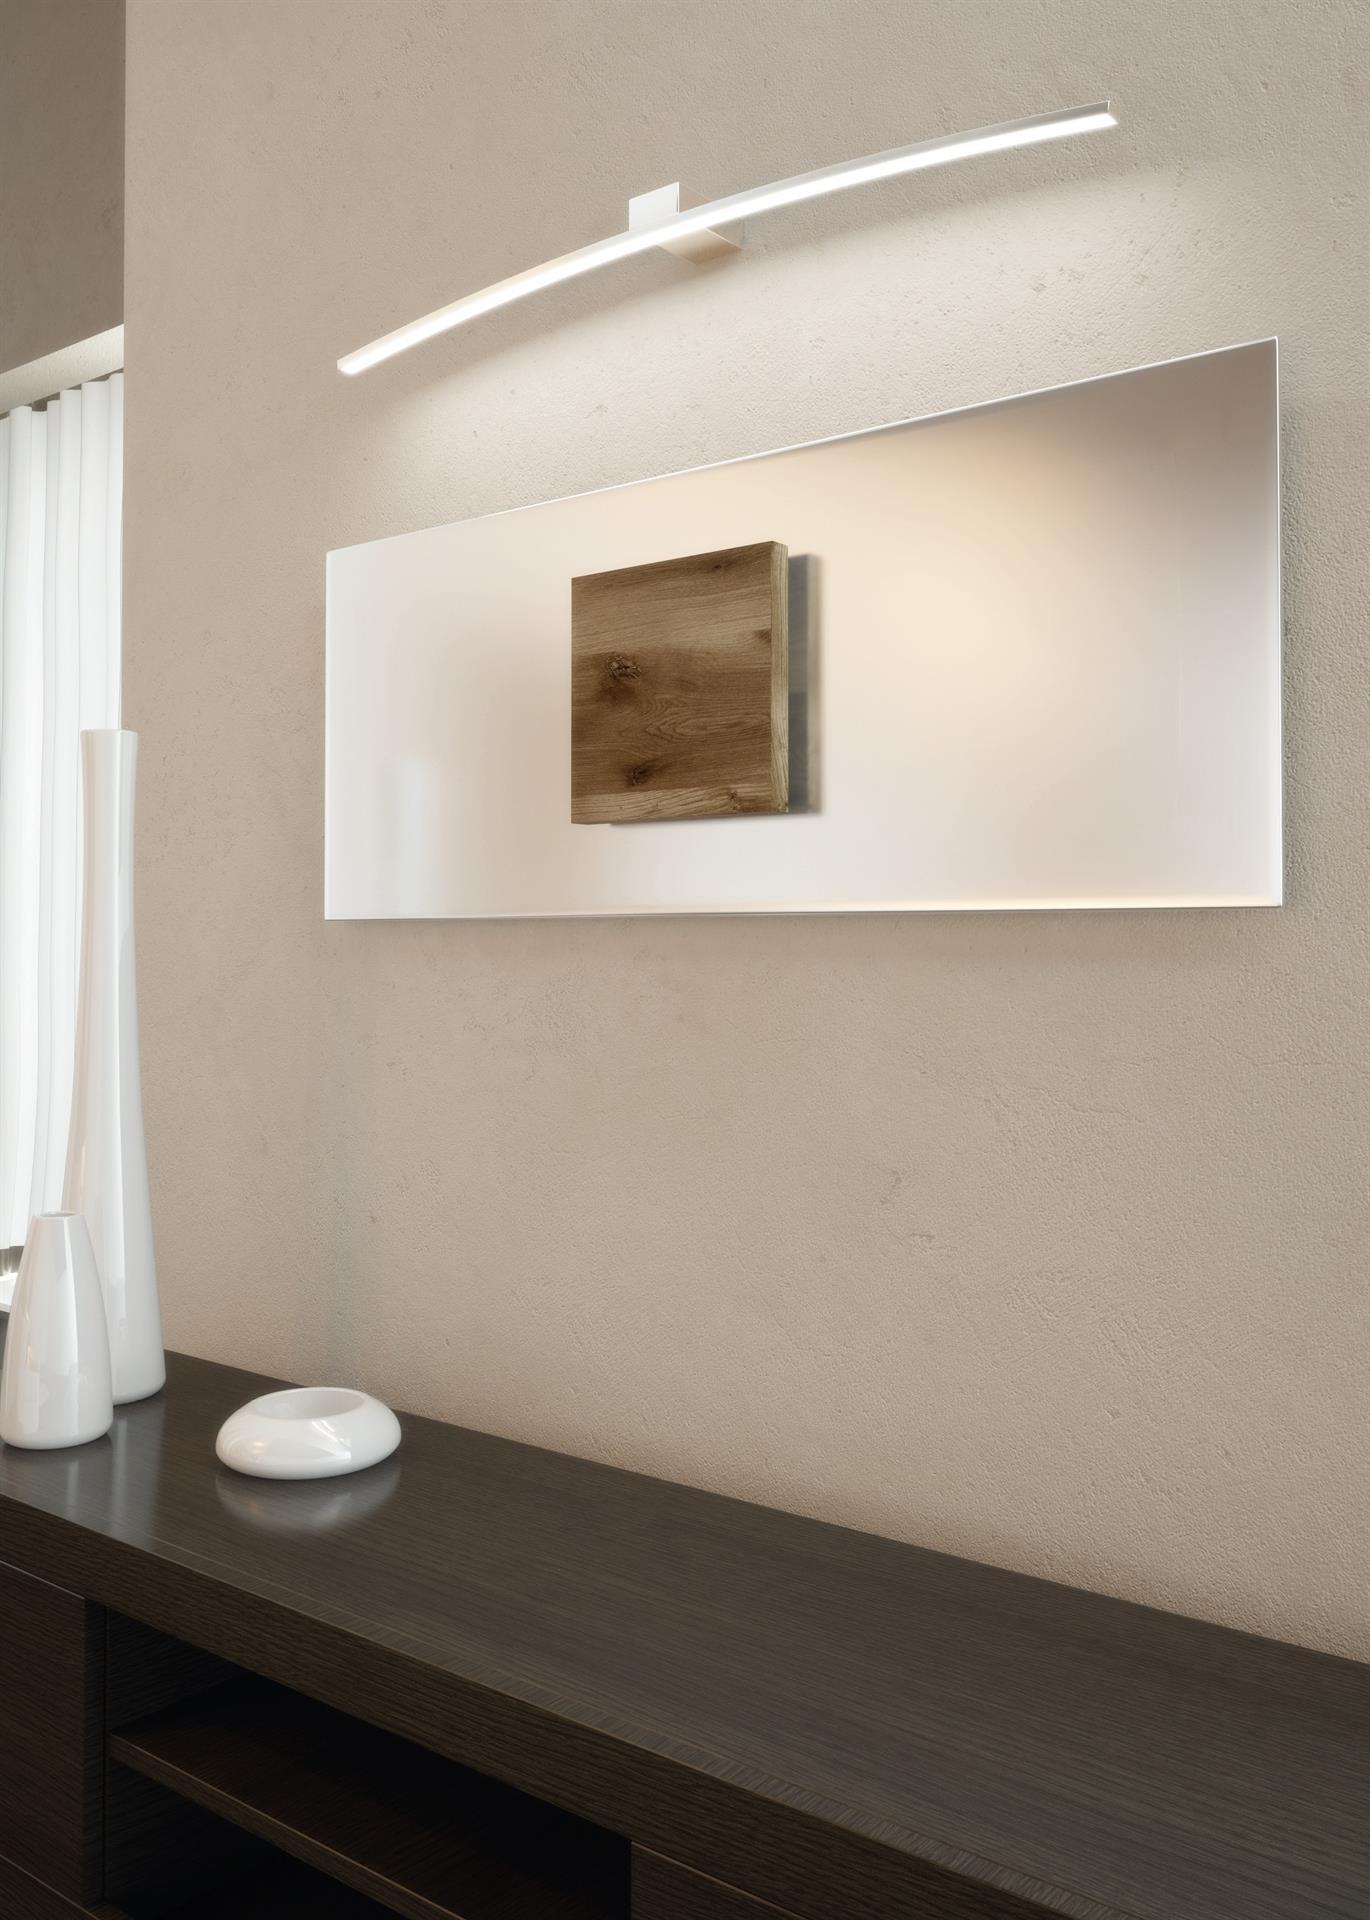 Specchio Bagno Bianco.Applique Da Bagno Bianco 70cm 11 2w 4000k Ip20 Top Light Curved